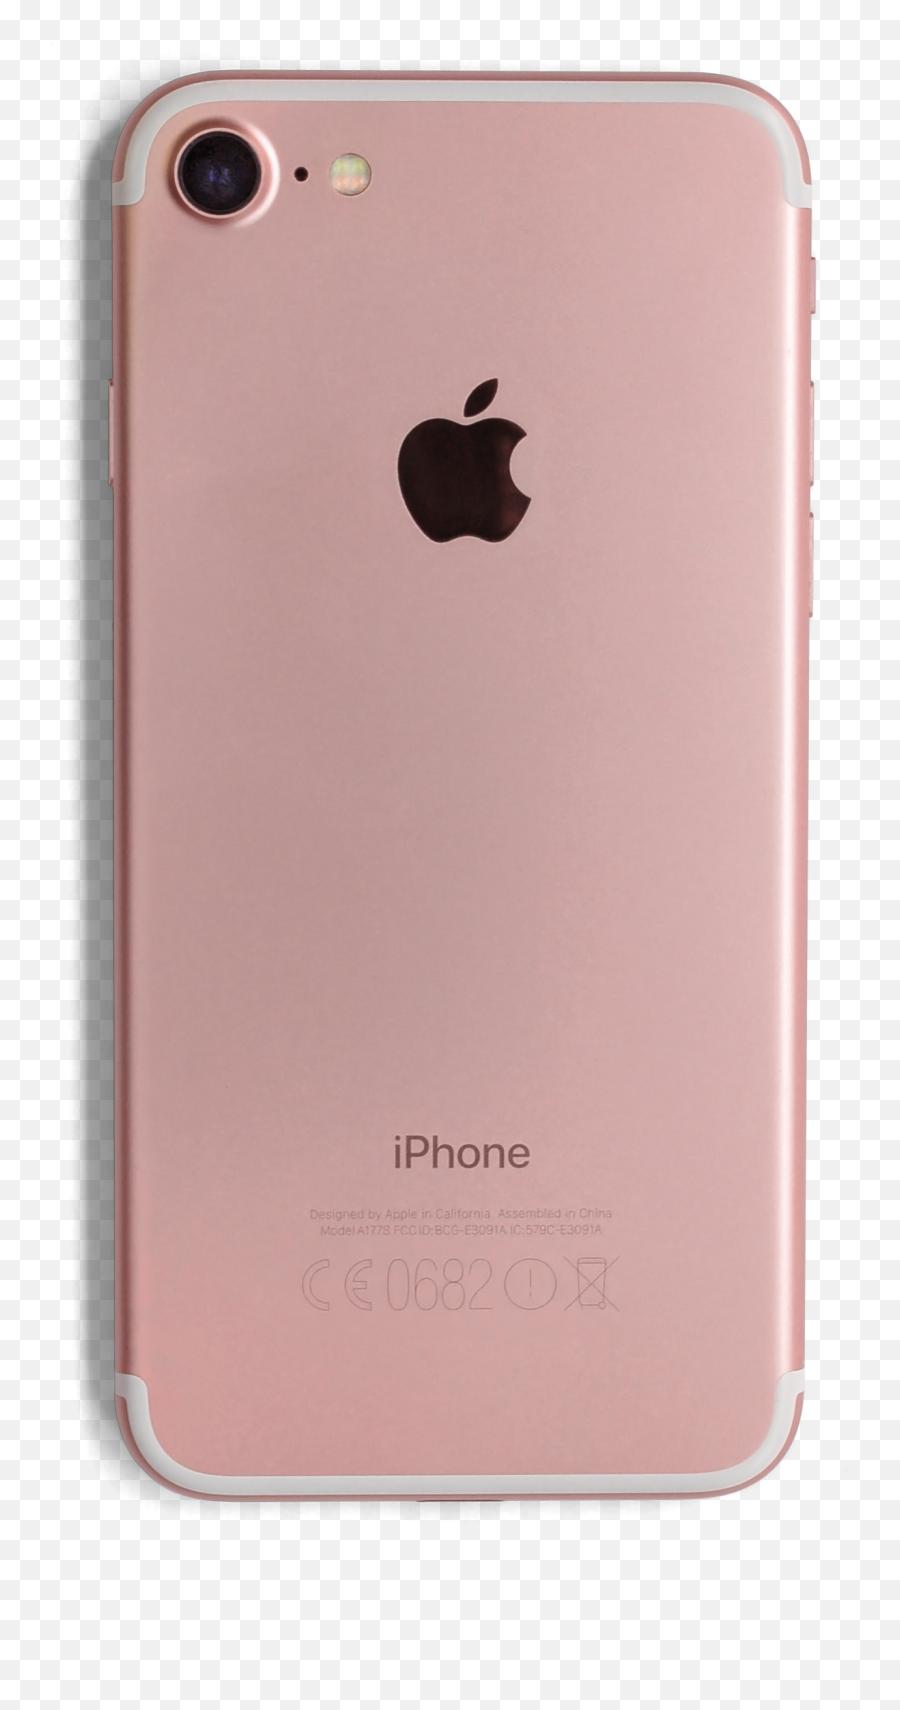 Iphone 7 - Phone Back Transparent Background Emoji,Emojis On Iphone 6